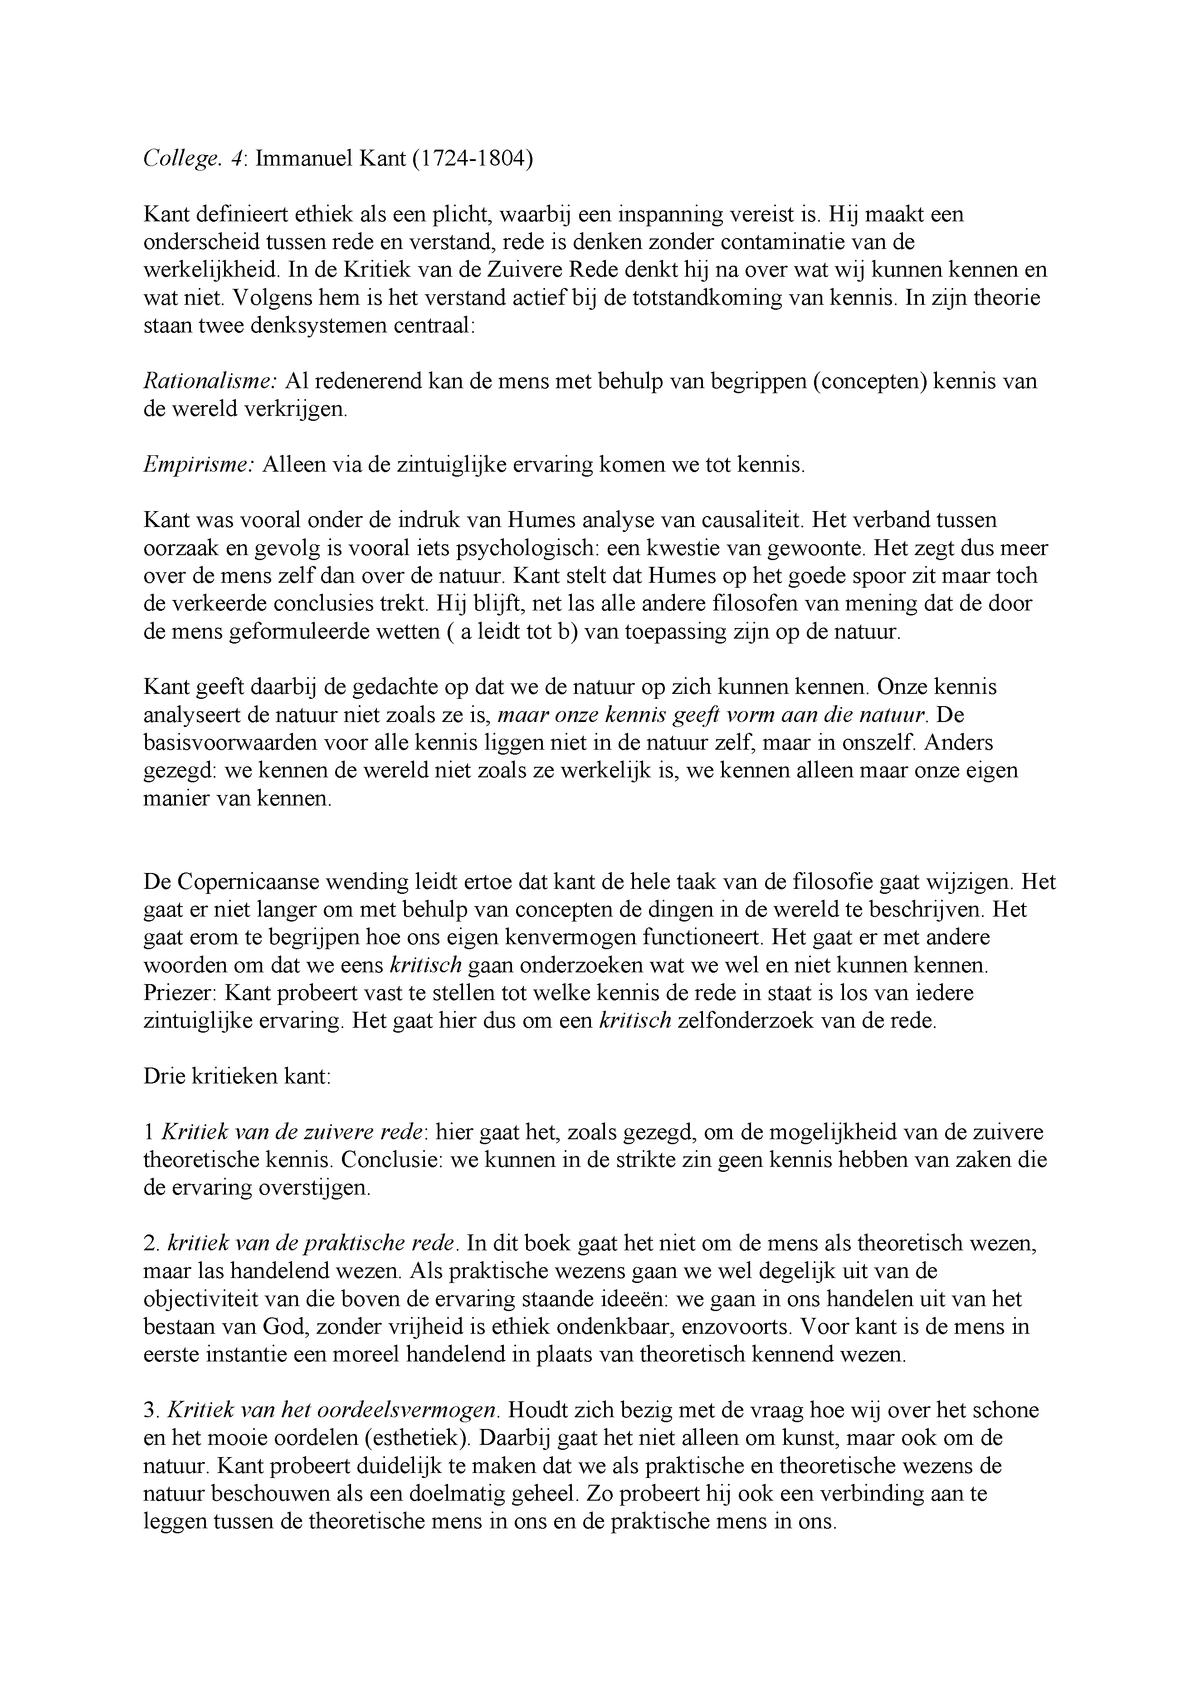 Kant College 4 Immanuel Kant Man Bin118po 2018 4 V